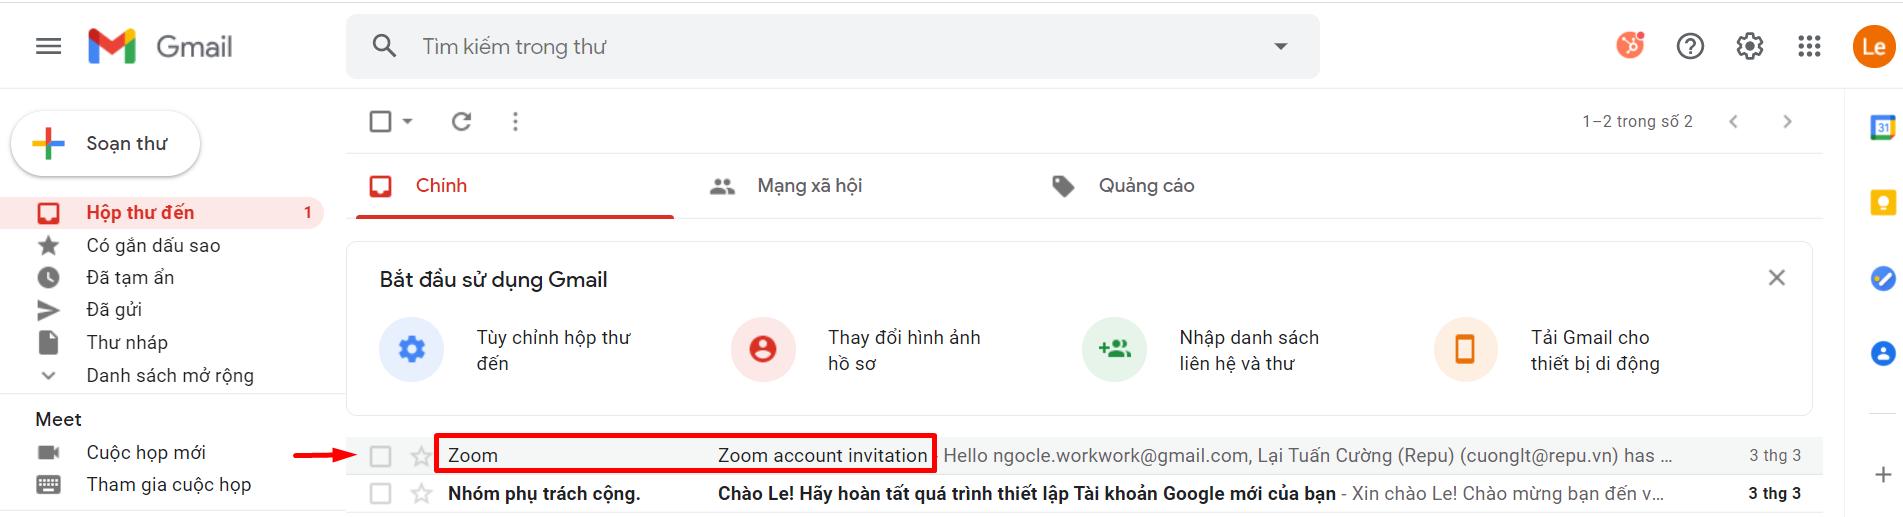 Email-kich-hoat-tai-khoan-tu-Zoom